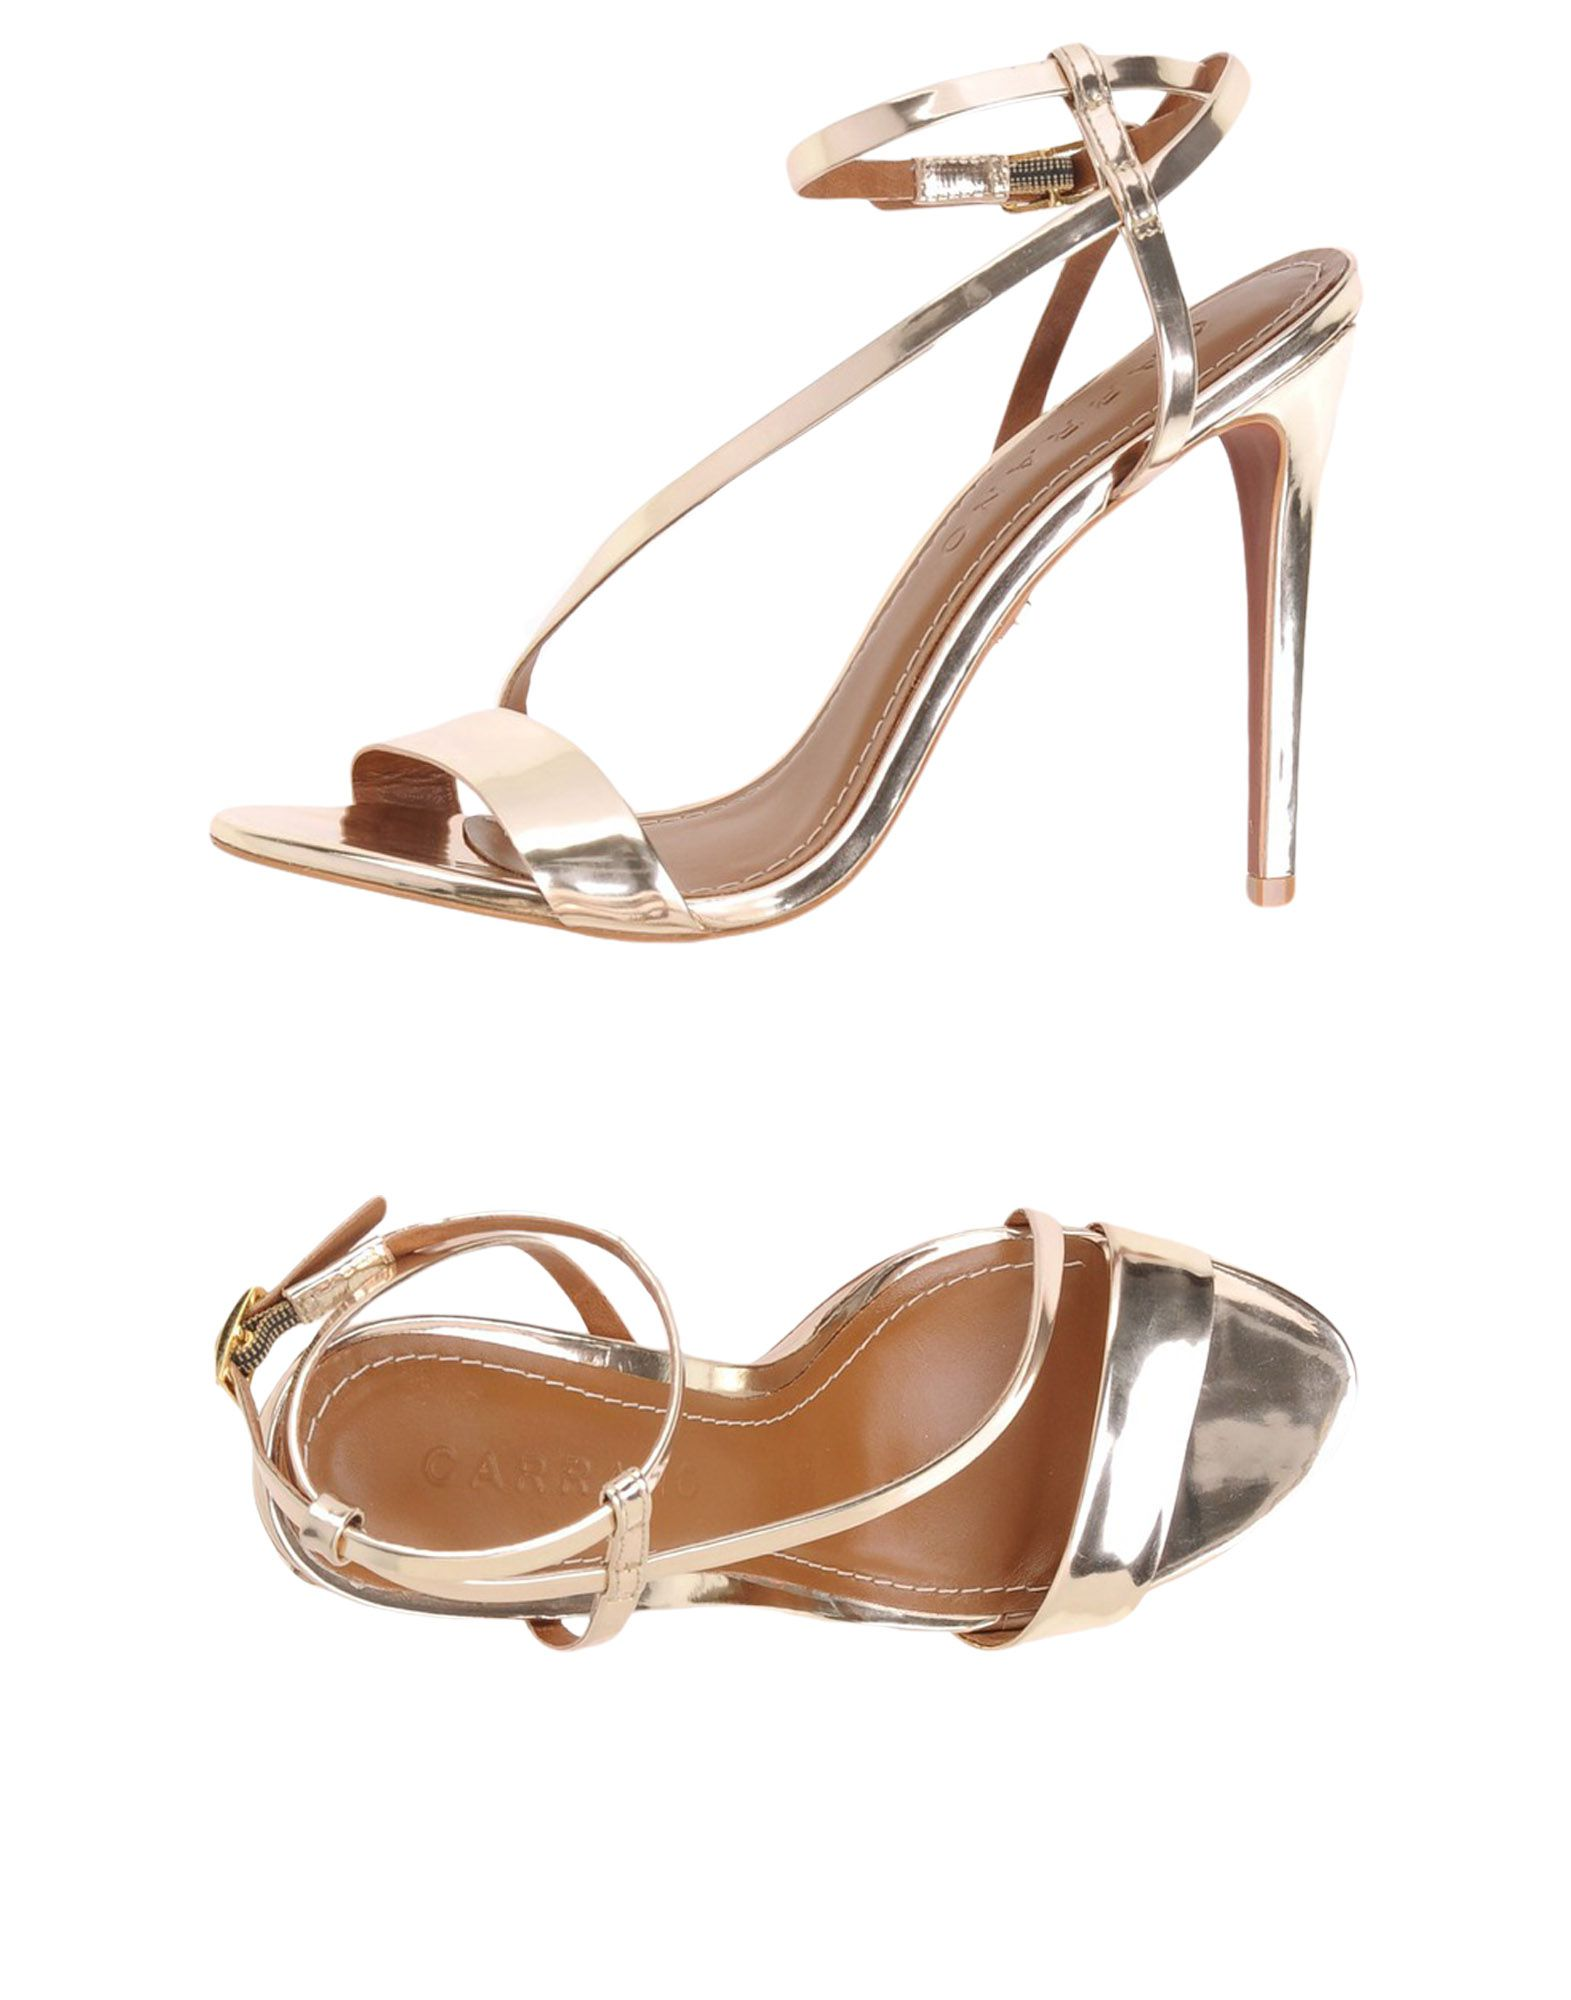 4b125fe5989 Carrano Carrano Carrano Slippers - Sandals - Women Carrano Sandals online  on United Kingdom - 11456708NQ 1921cd